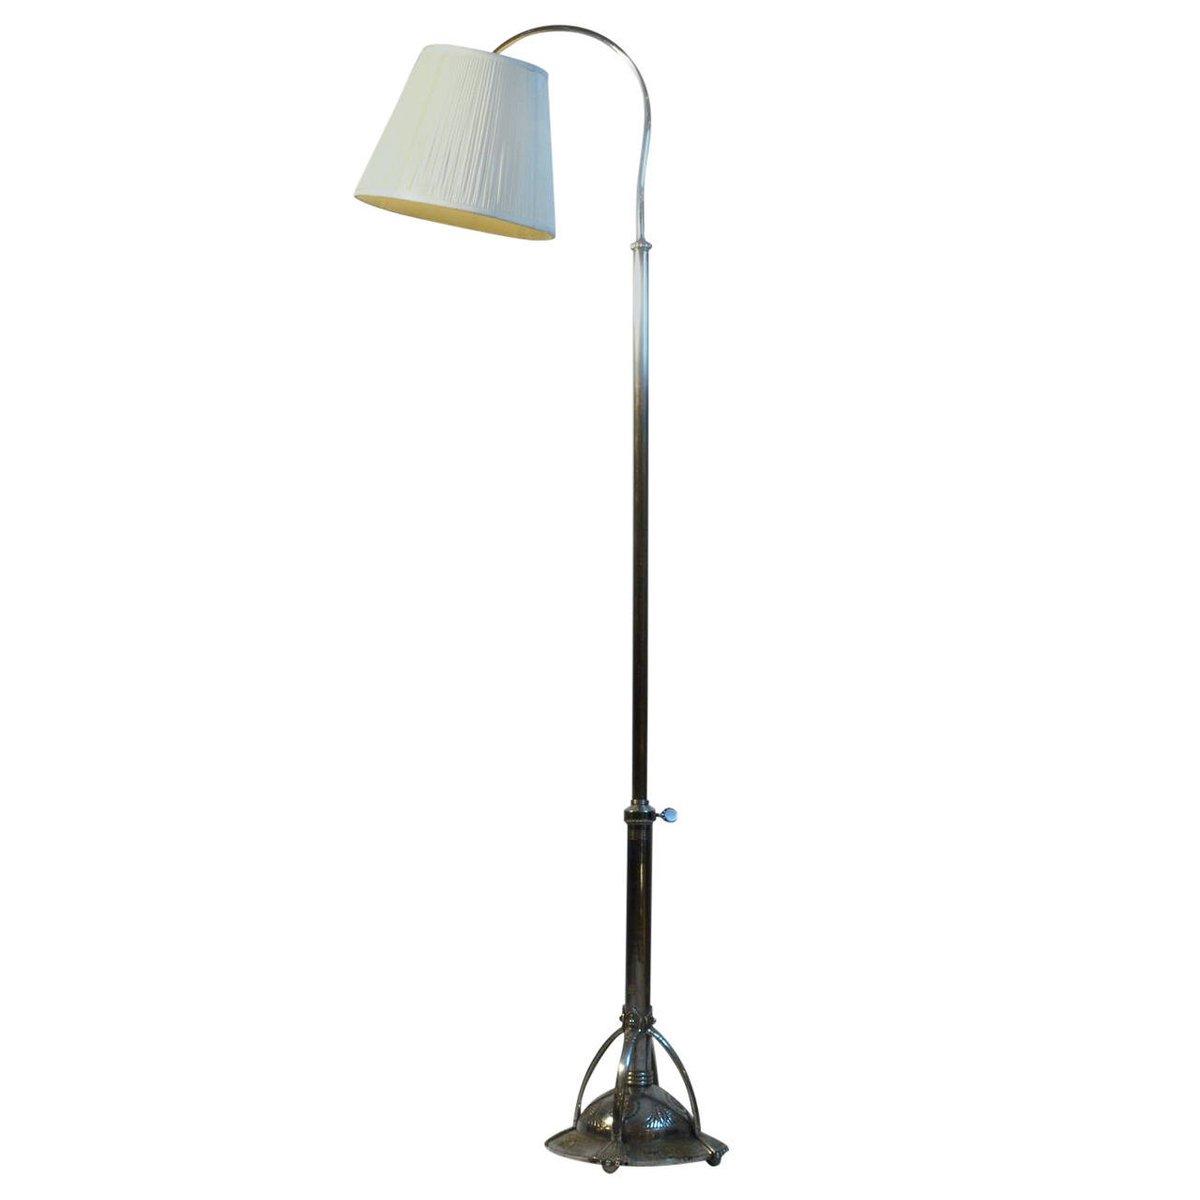 Vernickelte Art Deco Stehlampe